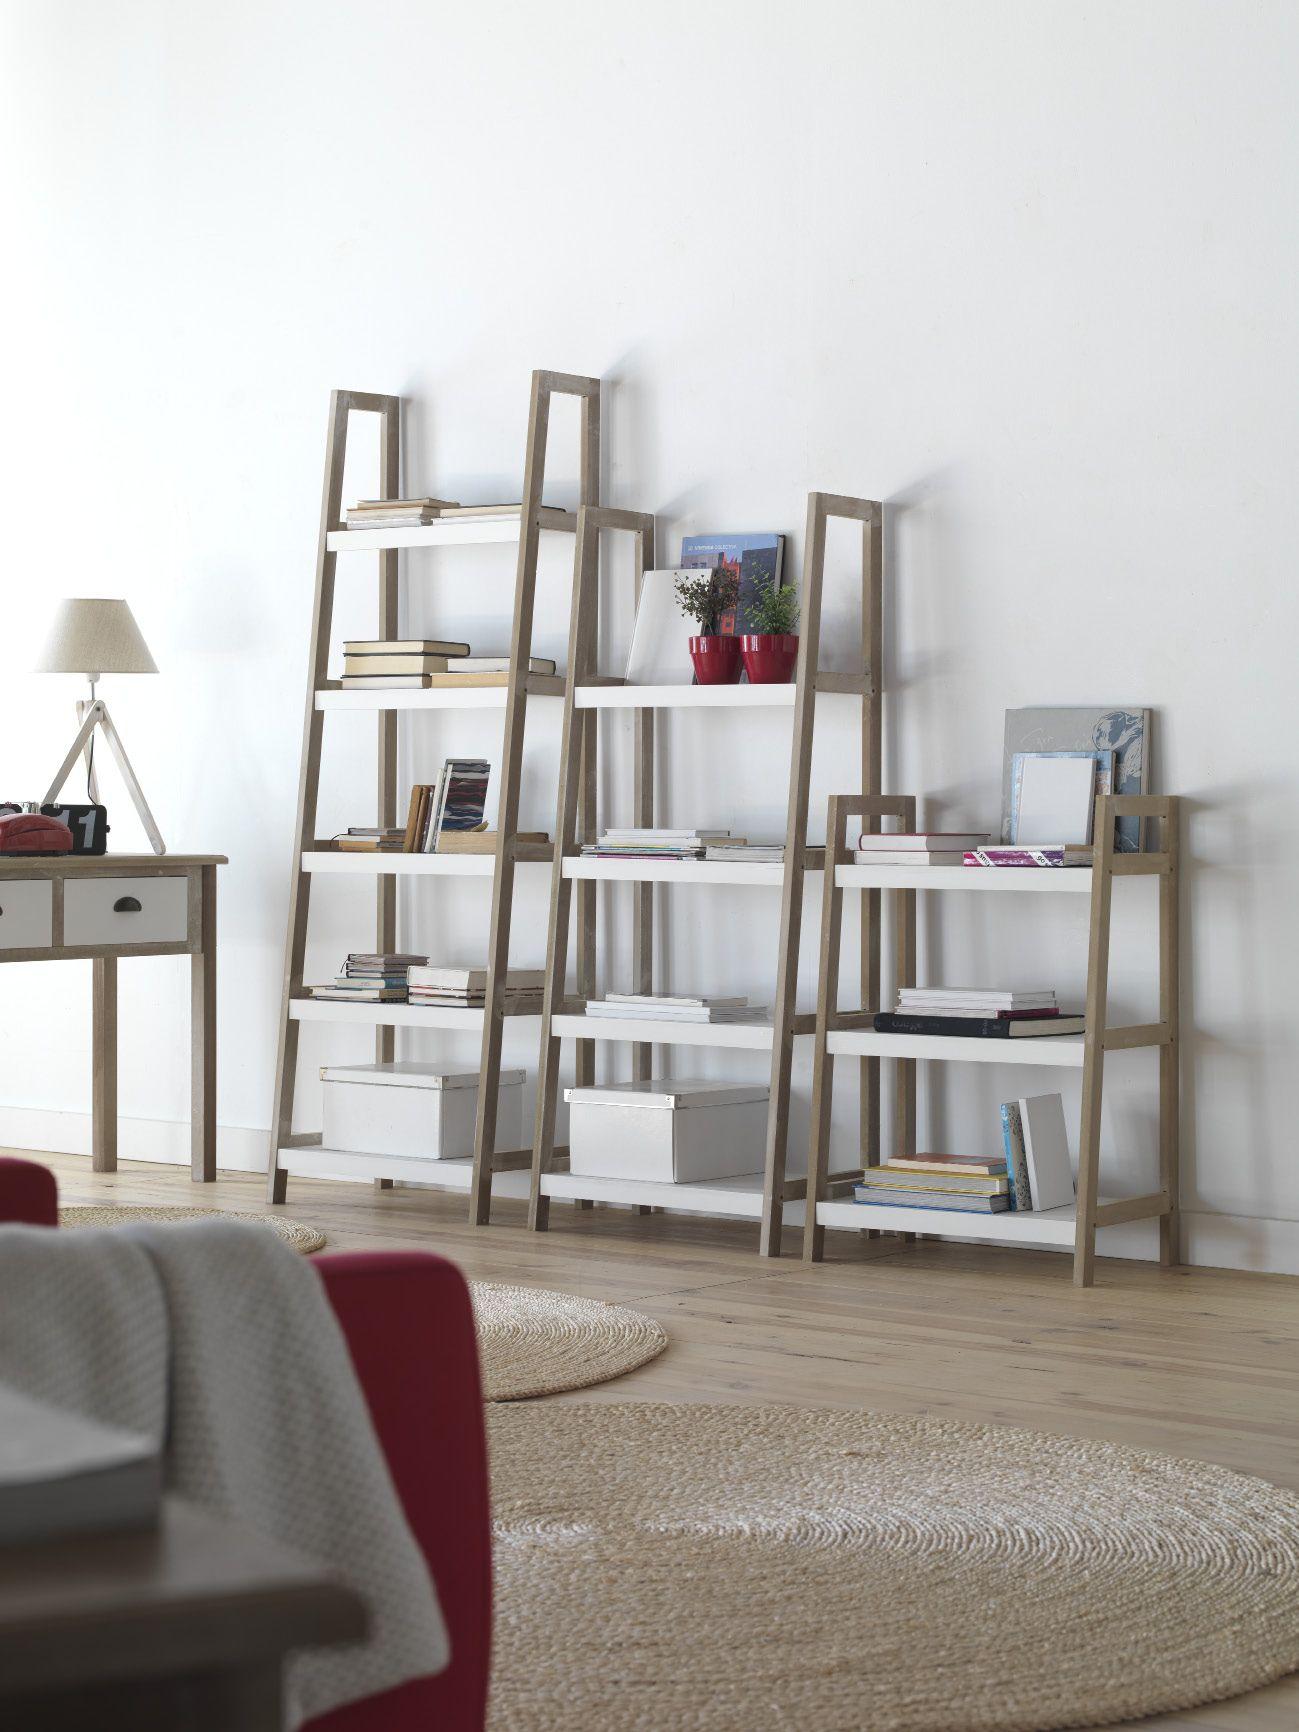 Cat logo muebles de interior gabar deco 2016 decoraci n de interiores exteriores terrazas - Catalogo decoracion interiores ...